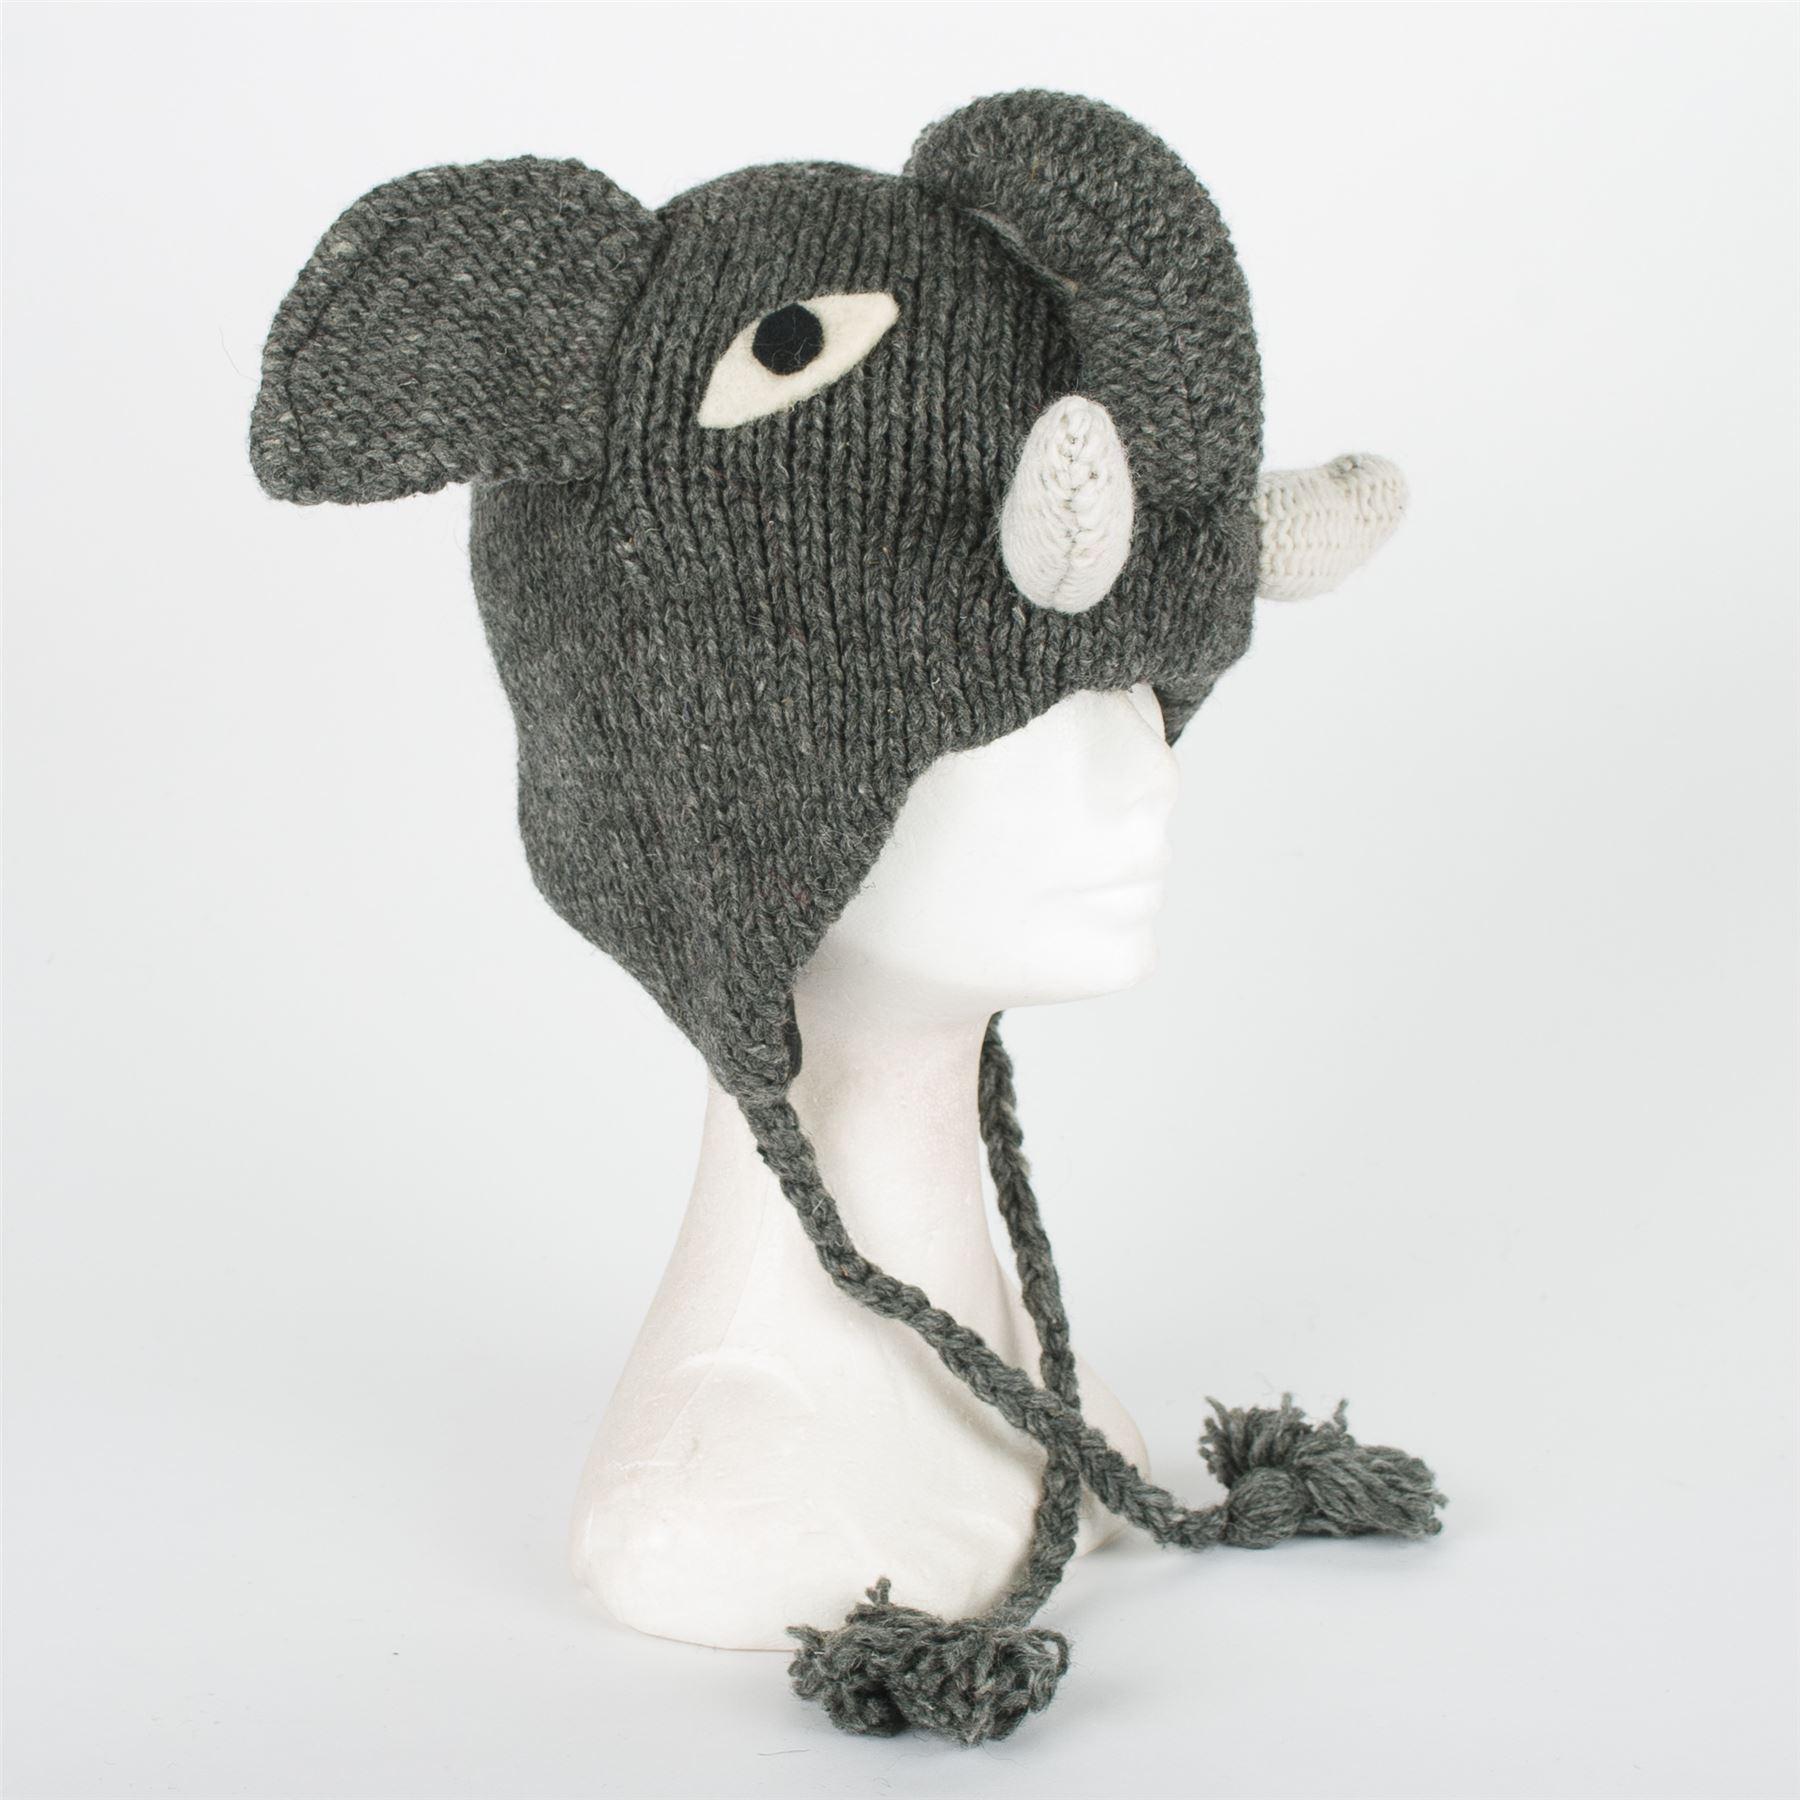 Knitting Pattern For Elephant Hat : Handmade Knit 100% Wool Unisex Animal Winter Nepal Hat, Elephant